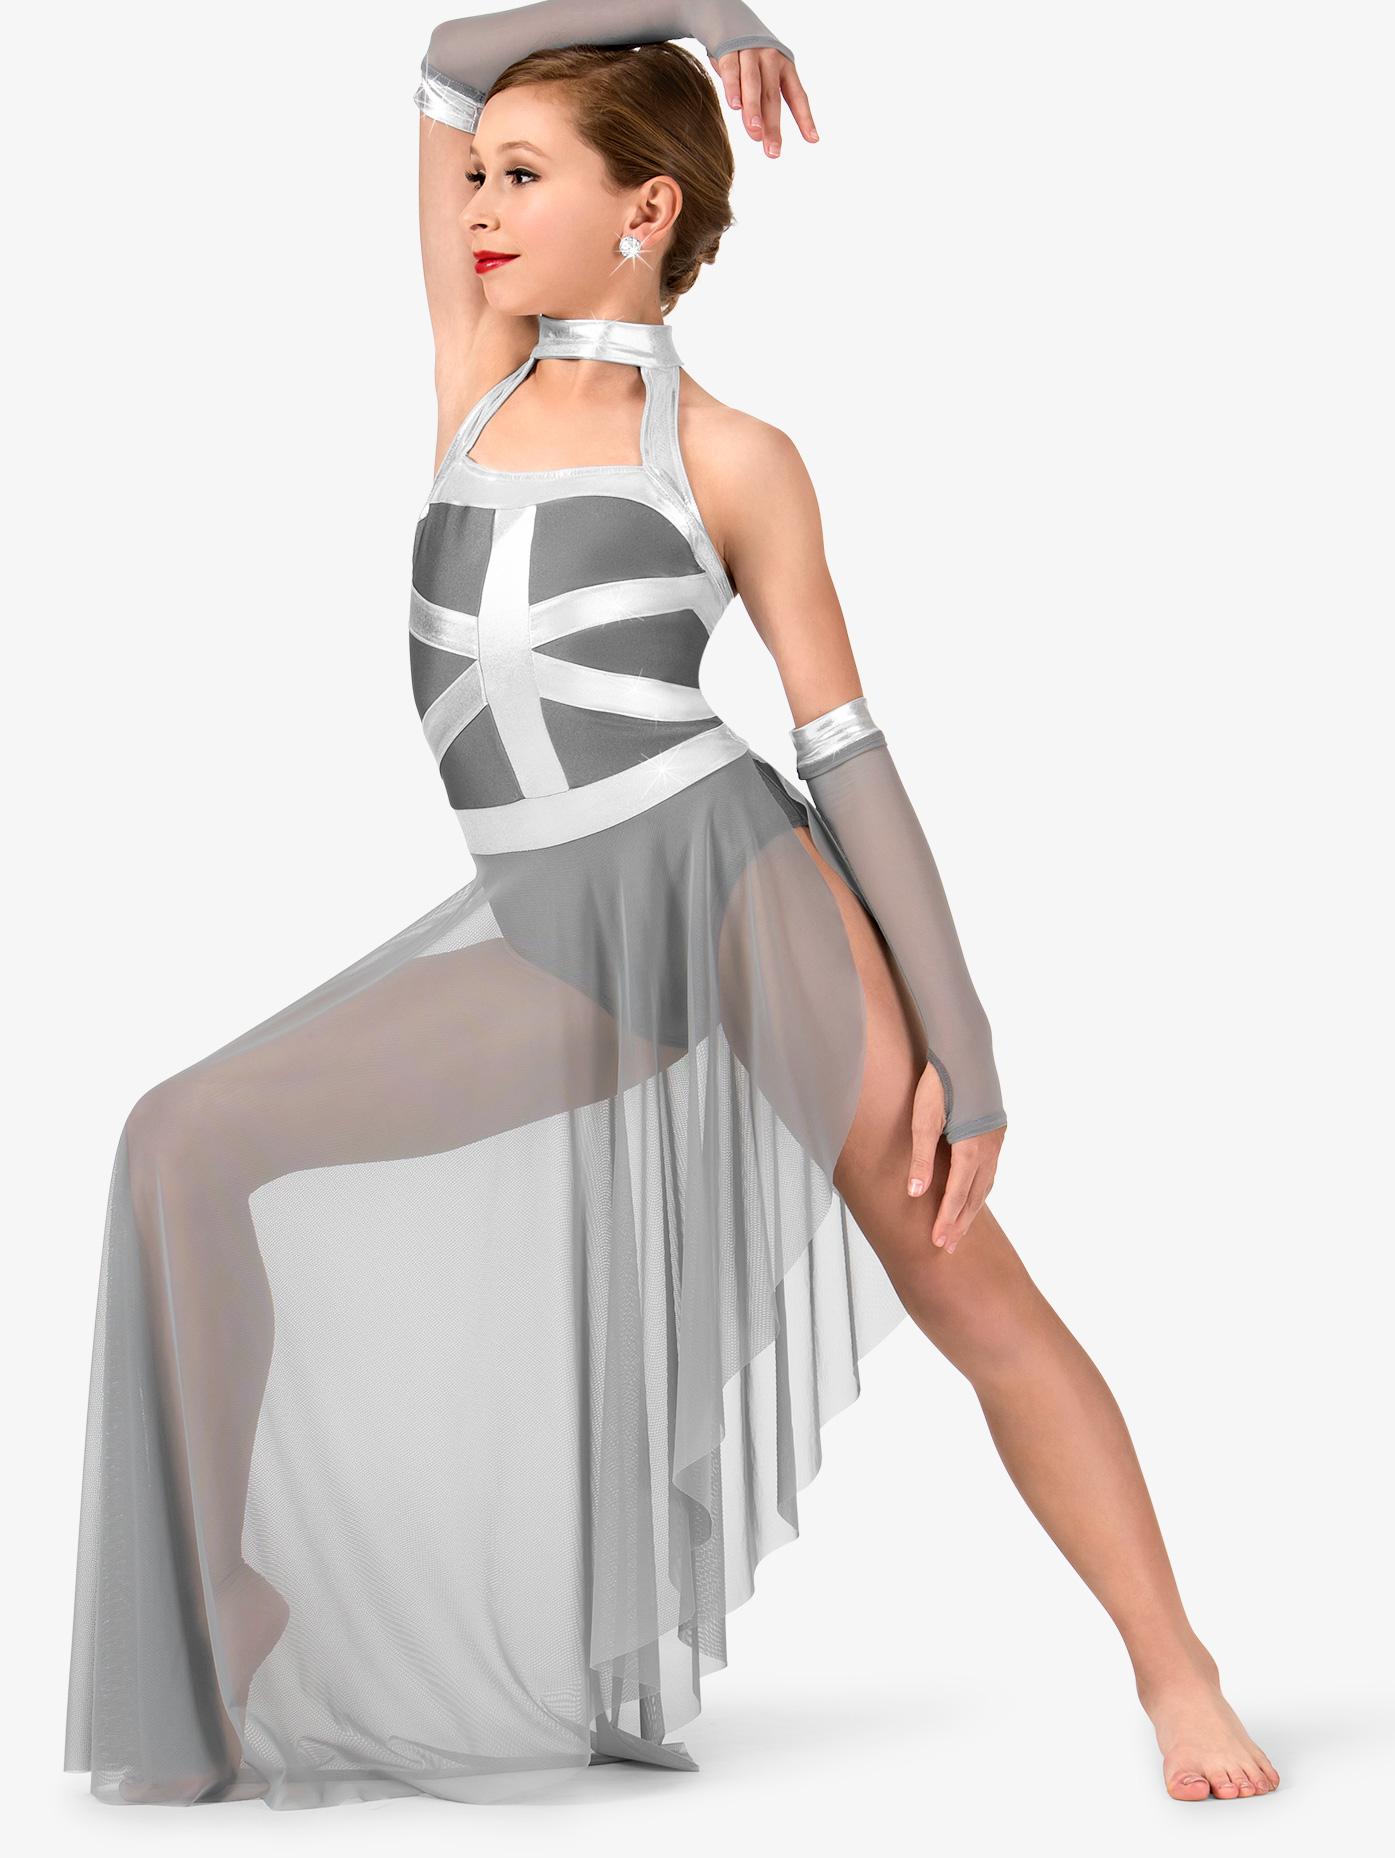 Elisse by Double Platinum Girls Asymmetrical Tank Performance Dress Set N7462C